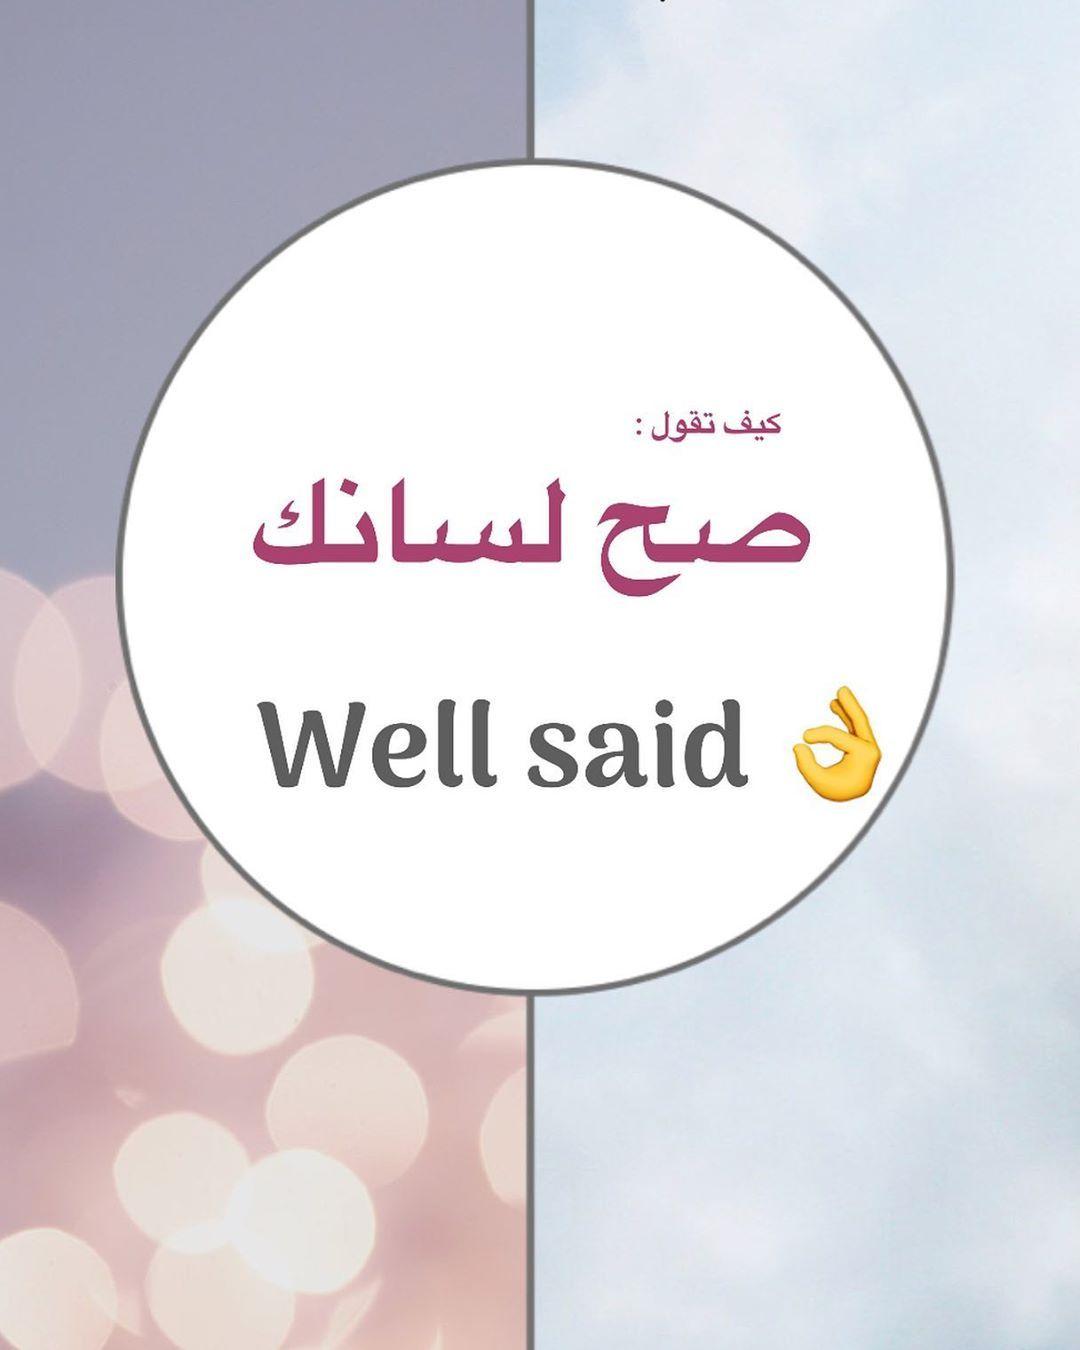 Eng Islam Q On Instagram تعلم انجليزي انجليزي انجلش السعودية الاردن صور ص English Learning Spoken English Language Learning Grammar English Vocabulary